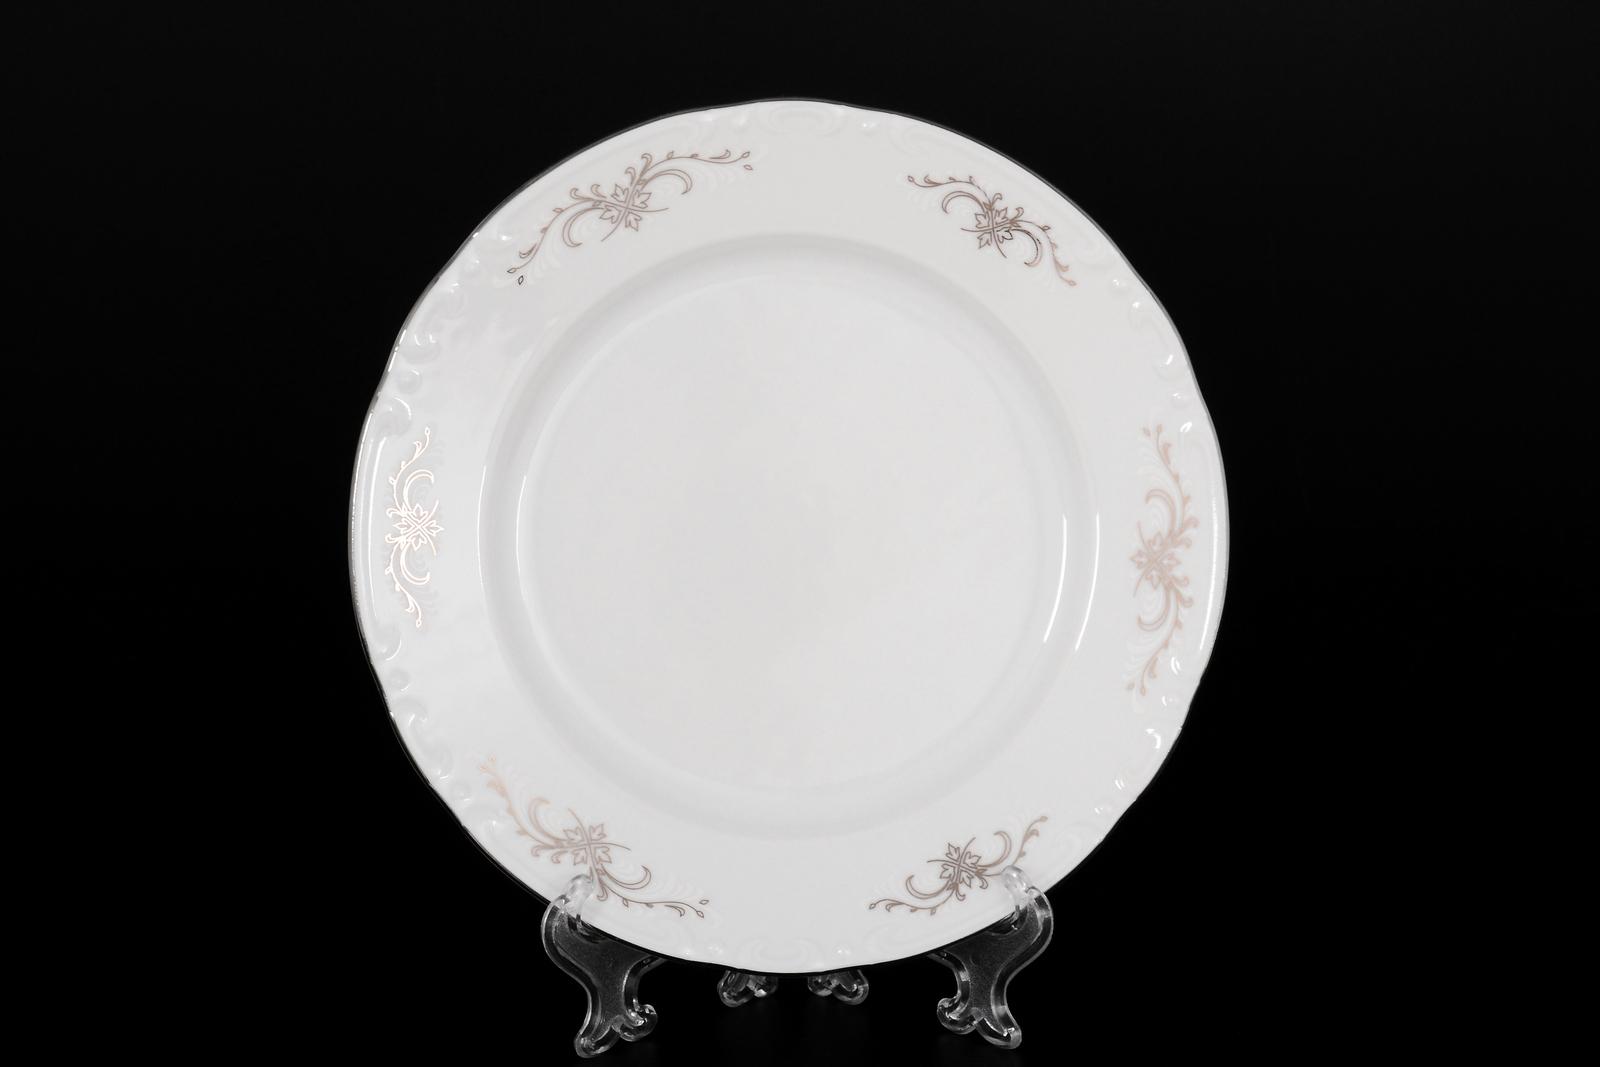 Набор тарелок 19 см Констанция Серый орнамент Отводка платина (6 шт)